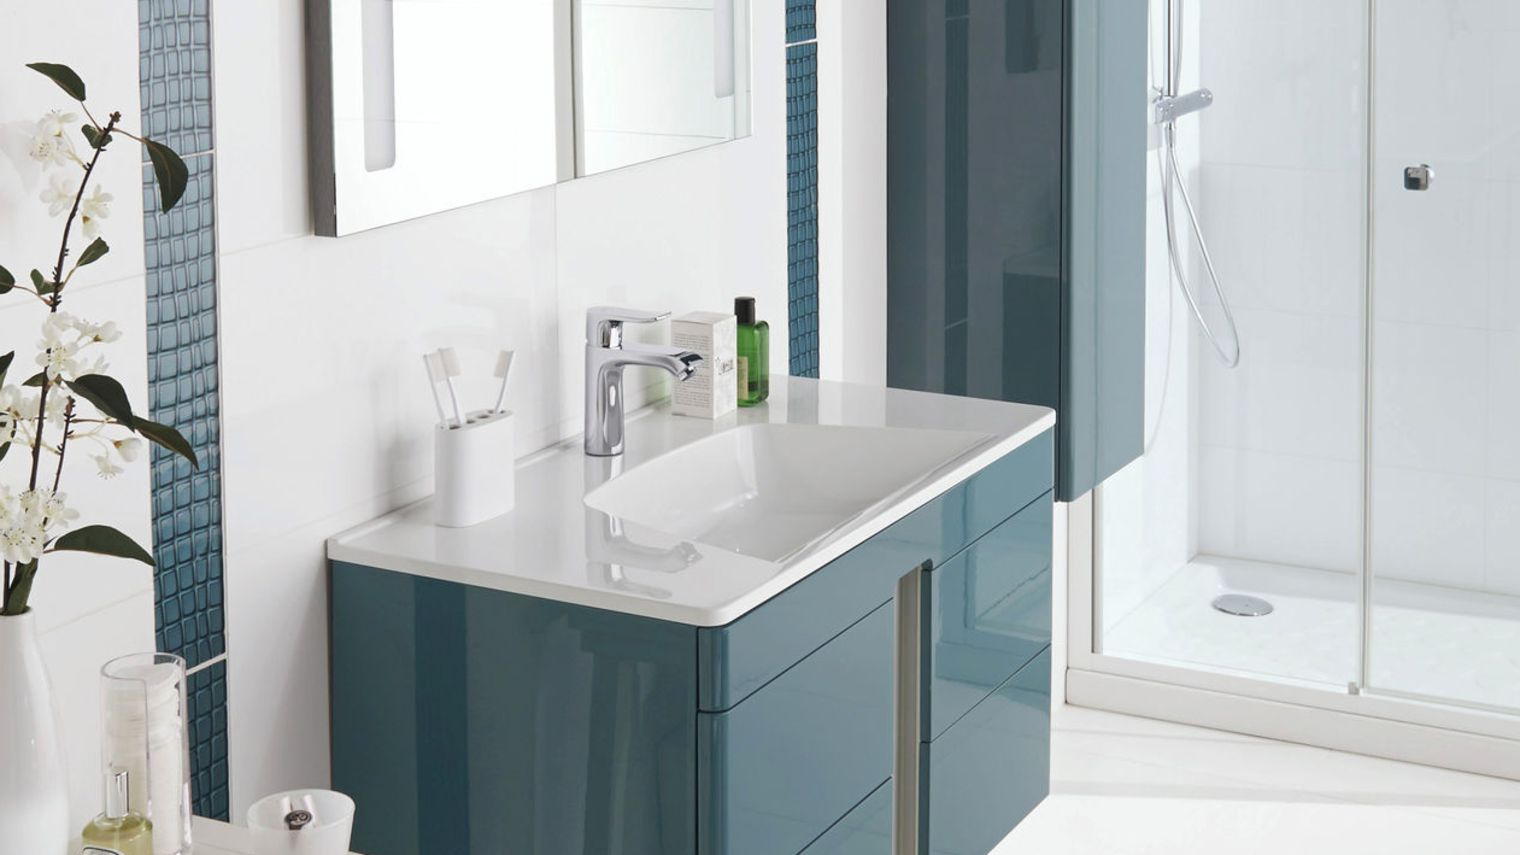 Vasque à Poser Ikea Beau Galerie De Bains Ikea Salle Désign